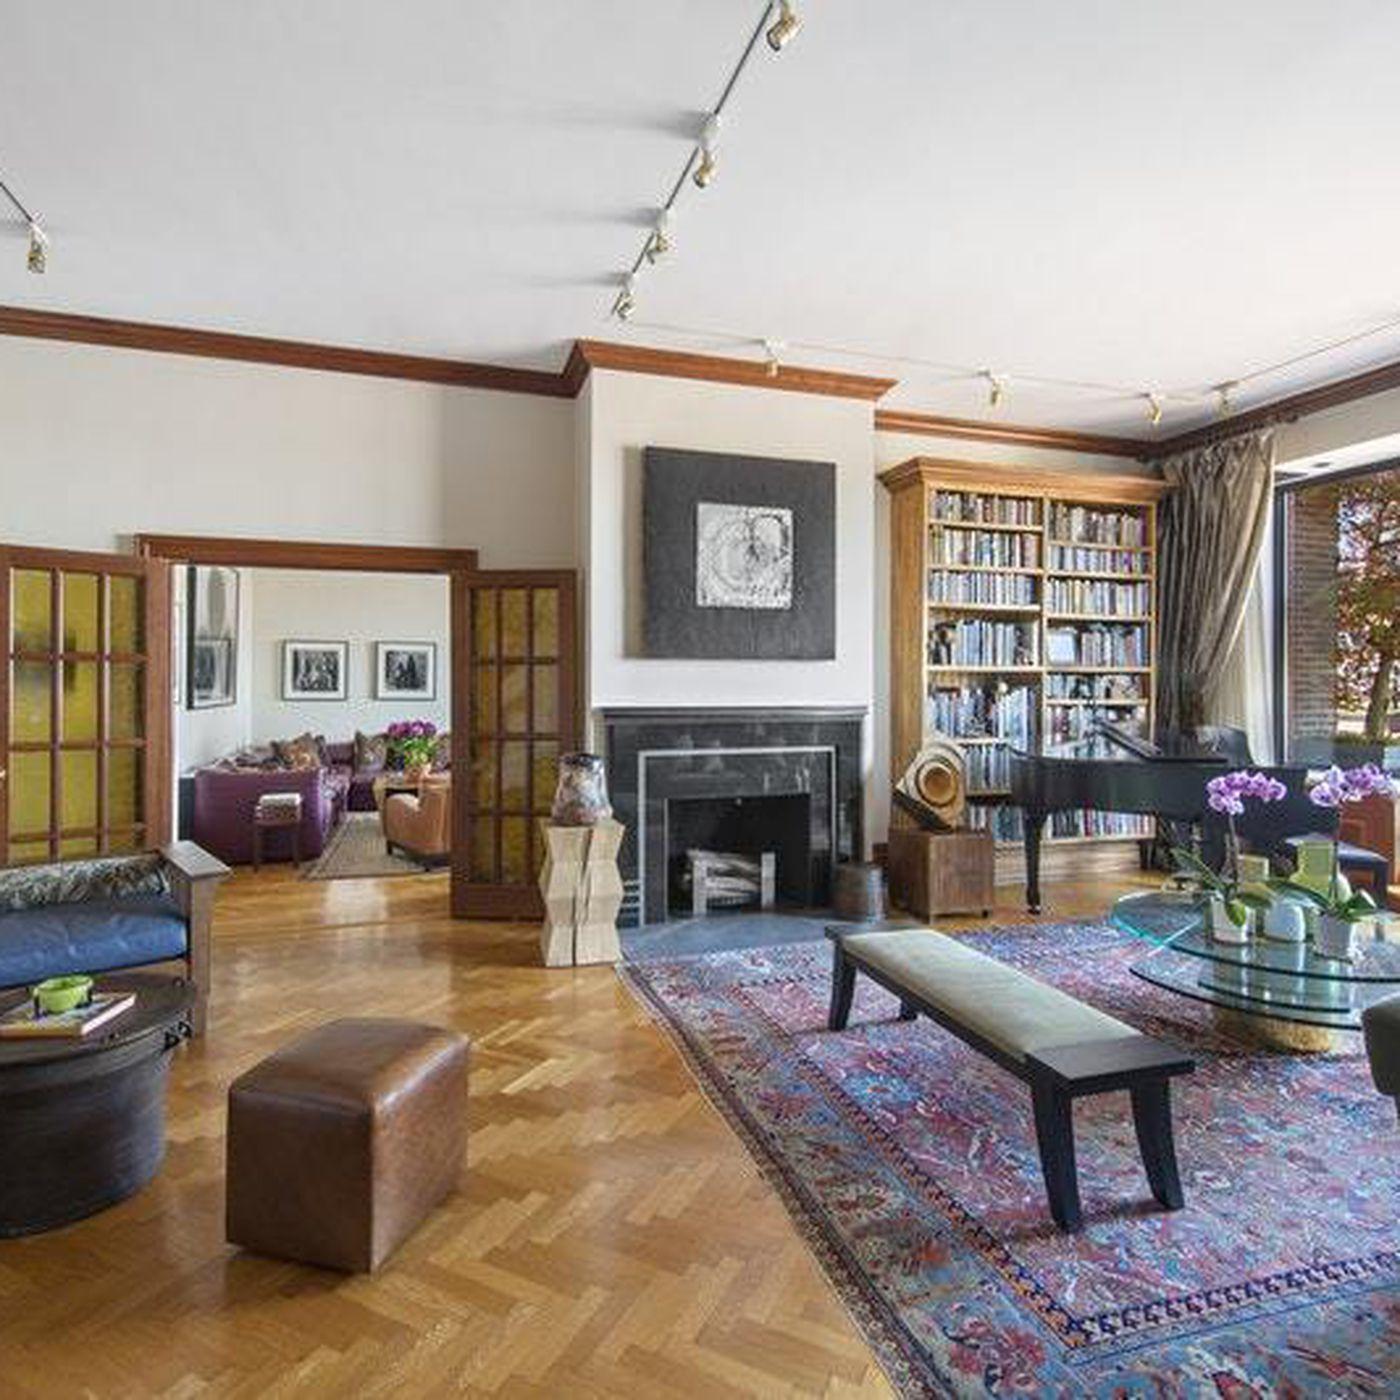 For $185M, A Park Avenue Penthouse With An Epic Terrace